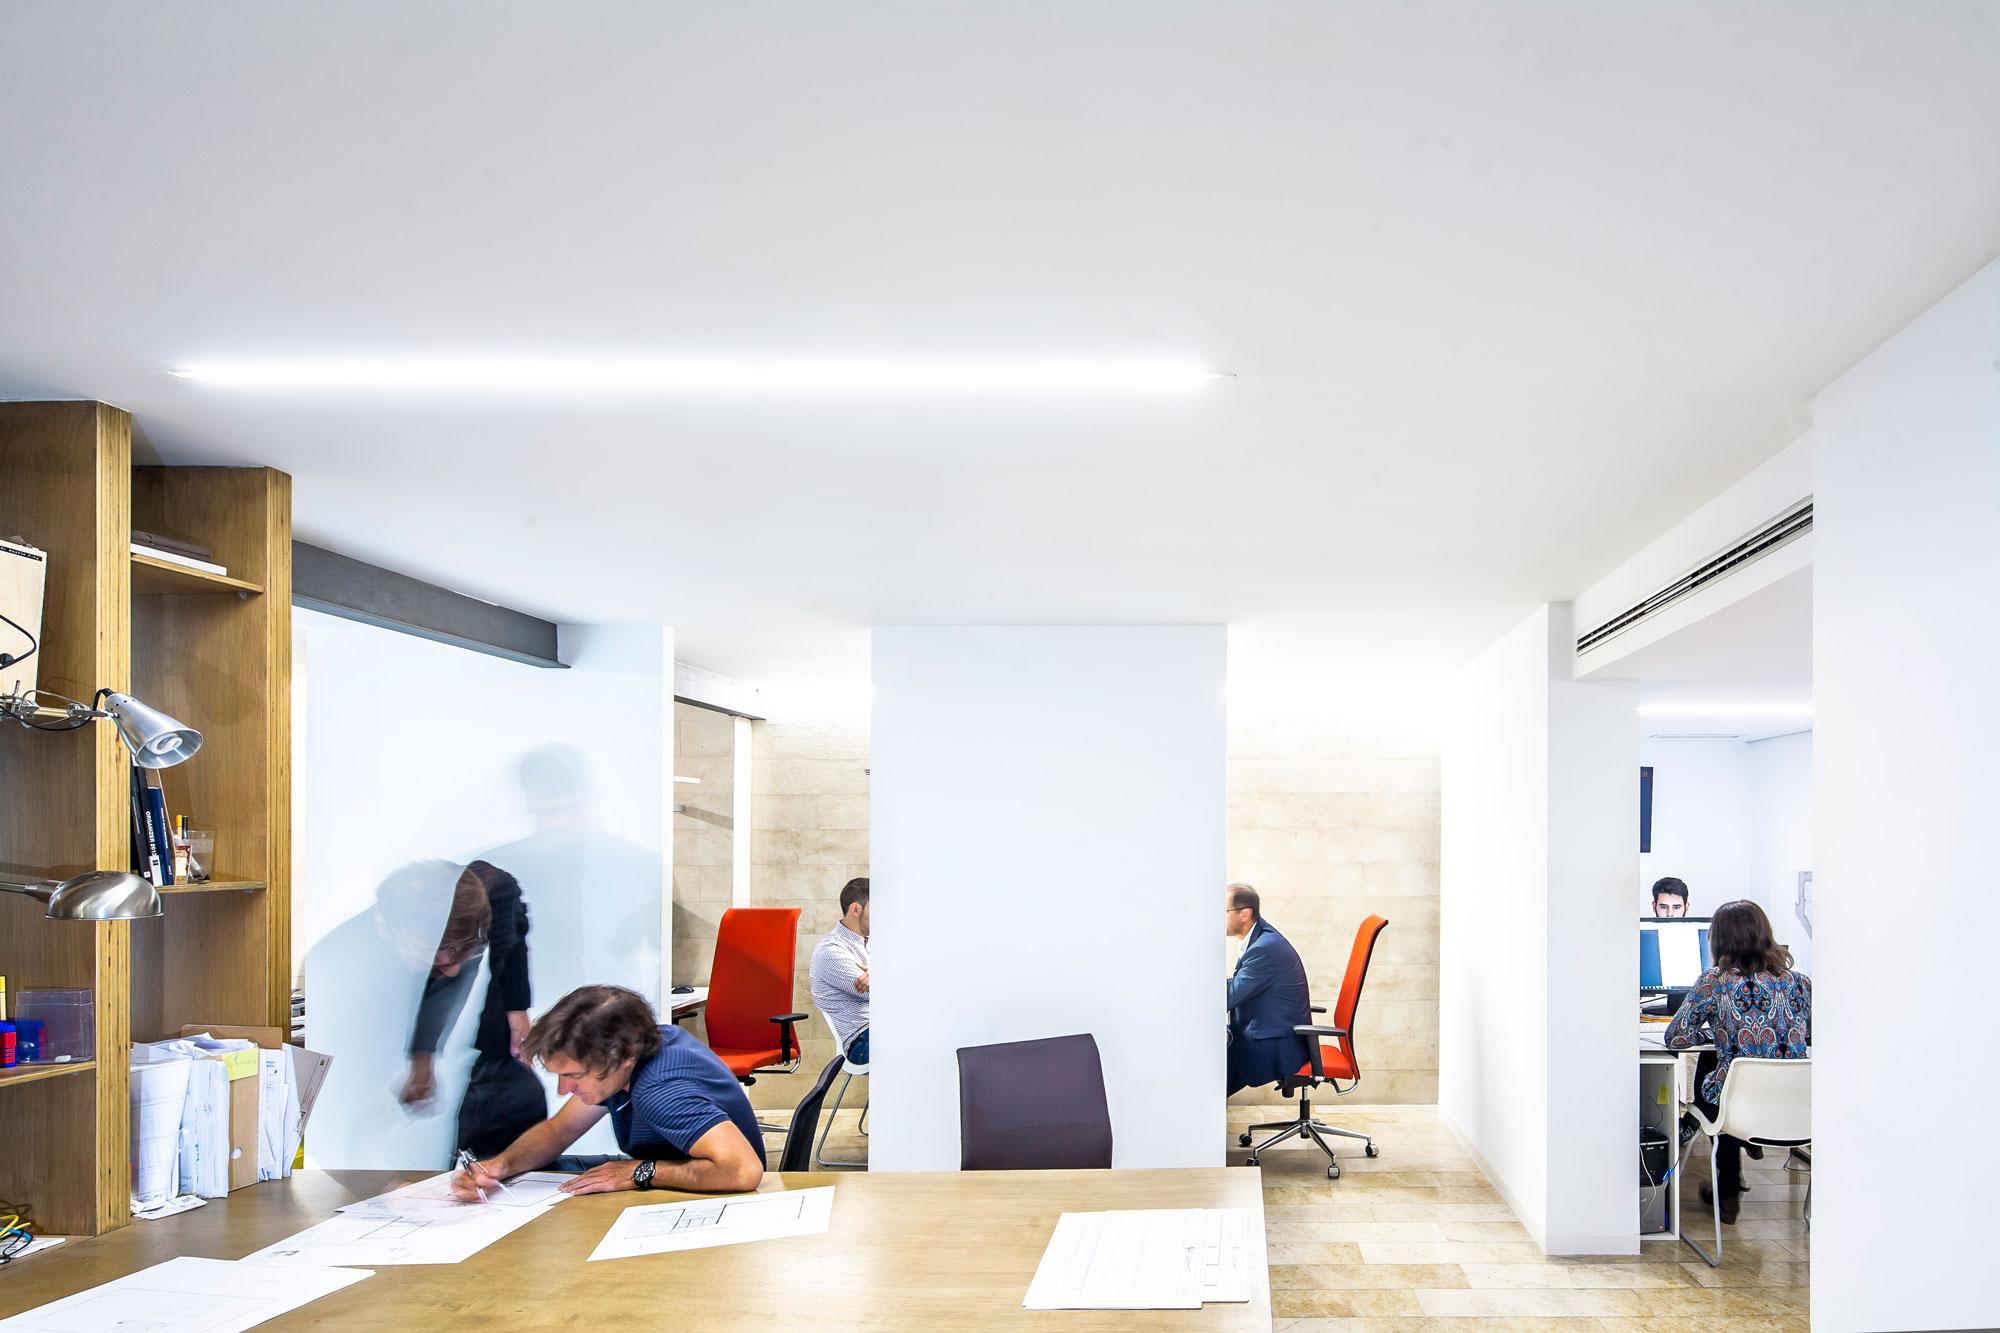 oficinas eneseis. Arquitectos Alicante. eneseis Arquitectura